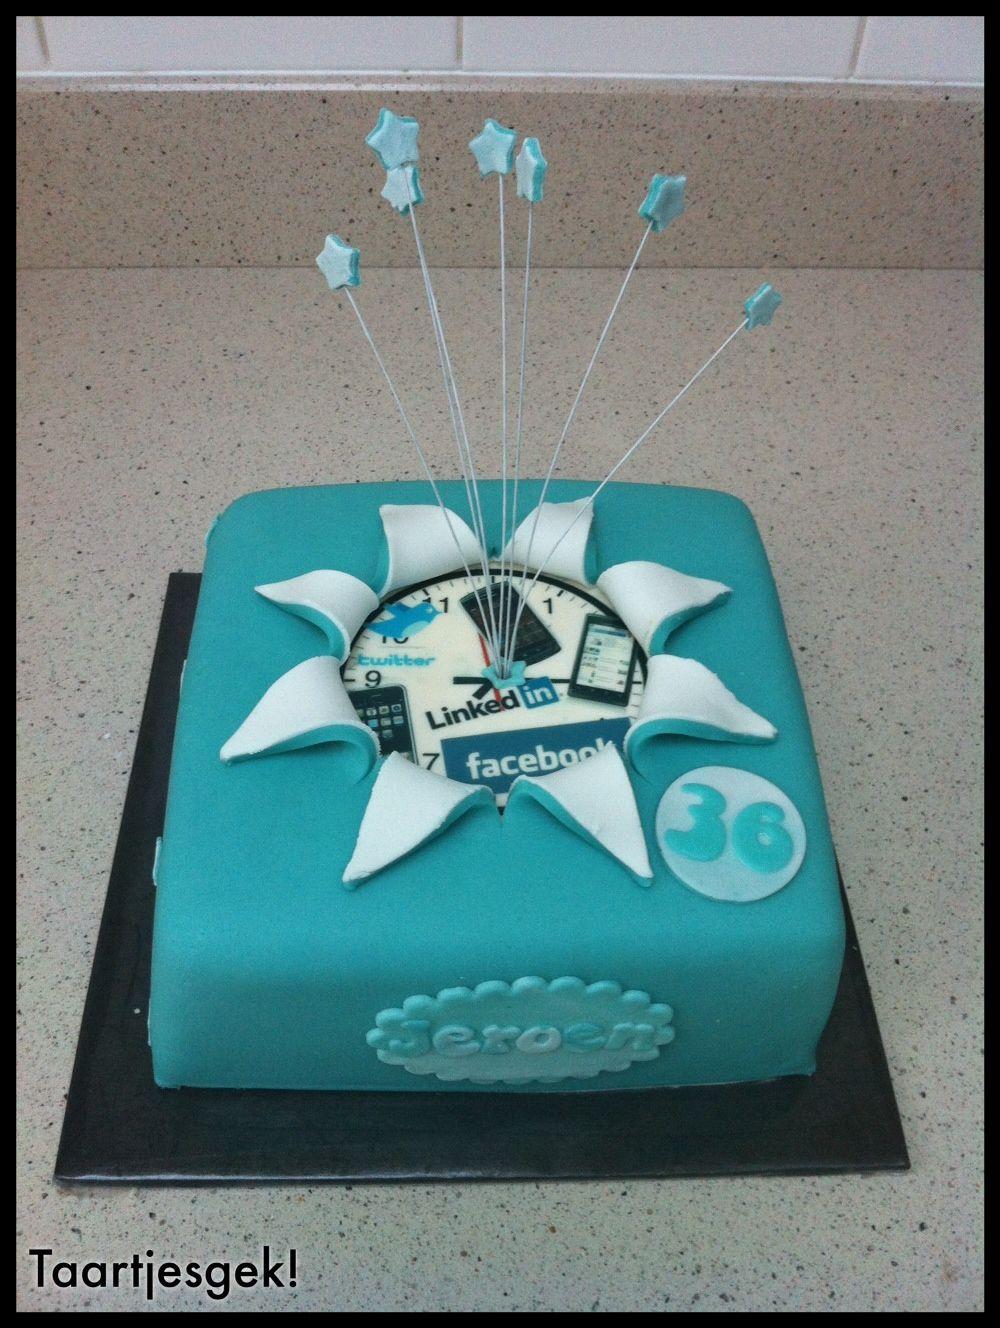 Social Media Cake - This is awesome! #hubze #socialmedia